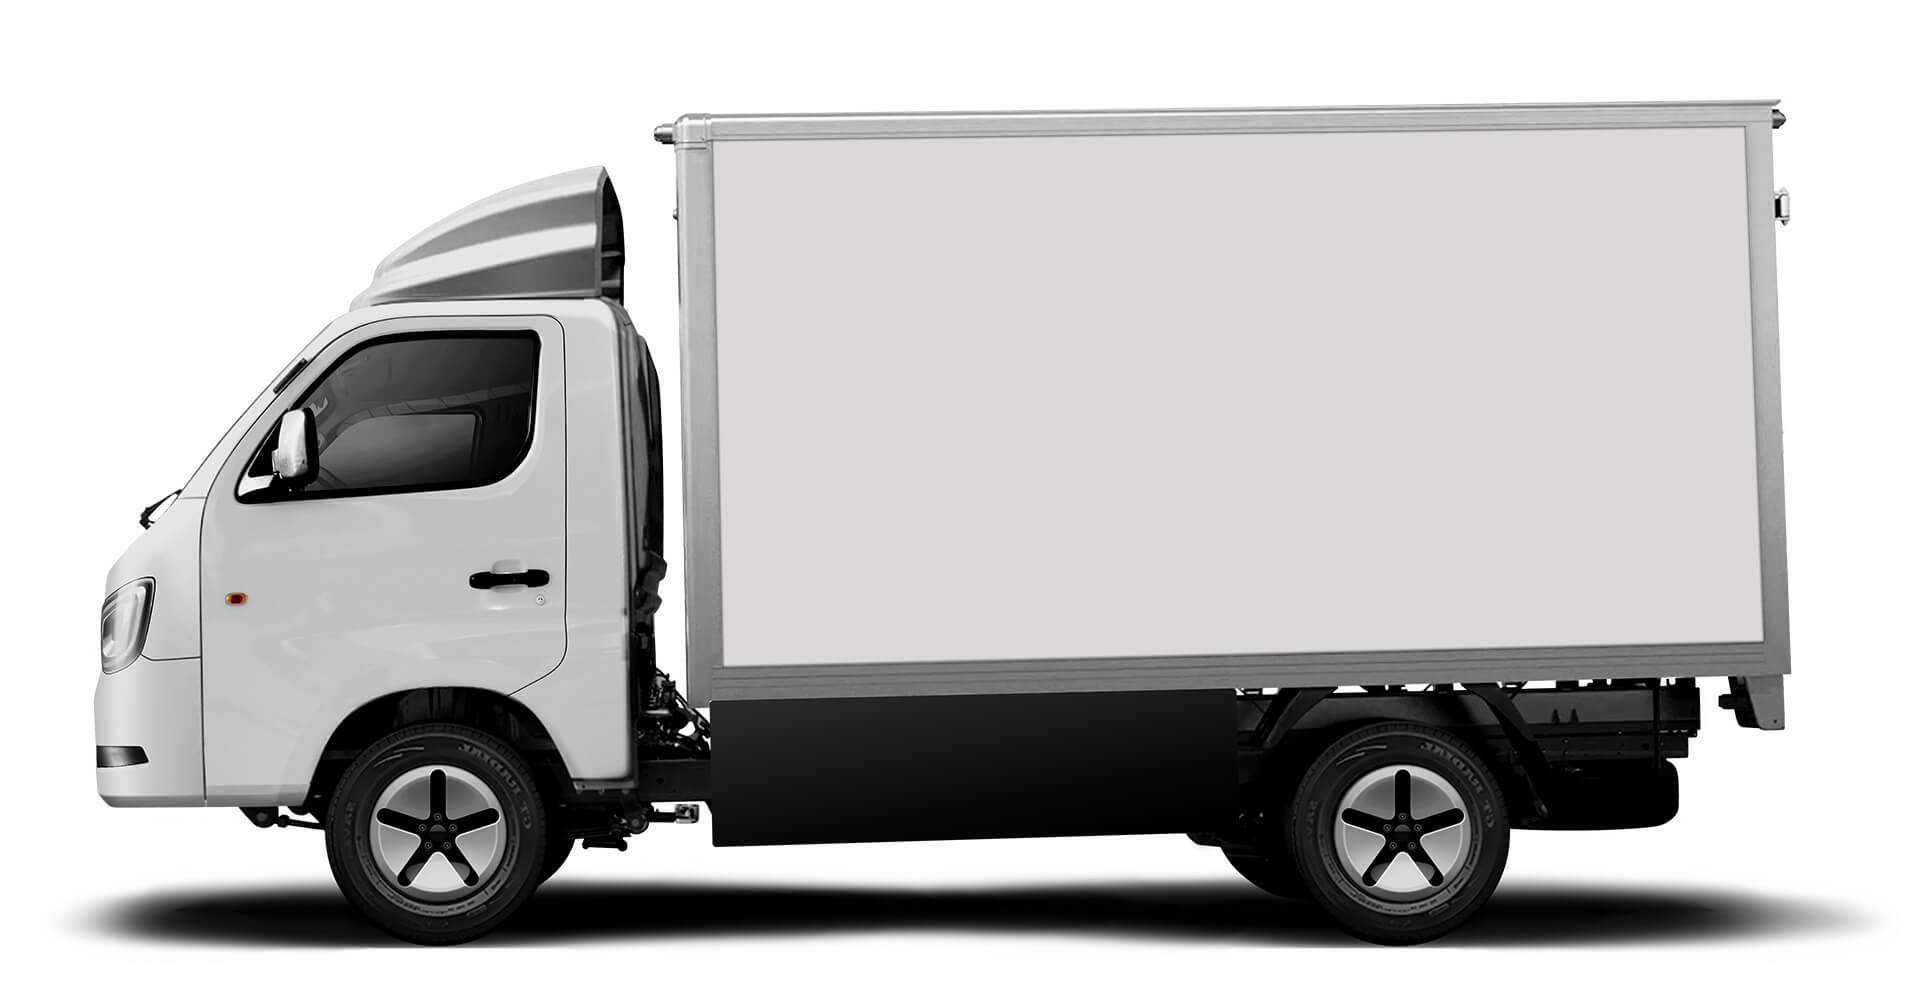 Электрический грузовик на суперконденсаторах Iona Truck - фото 3